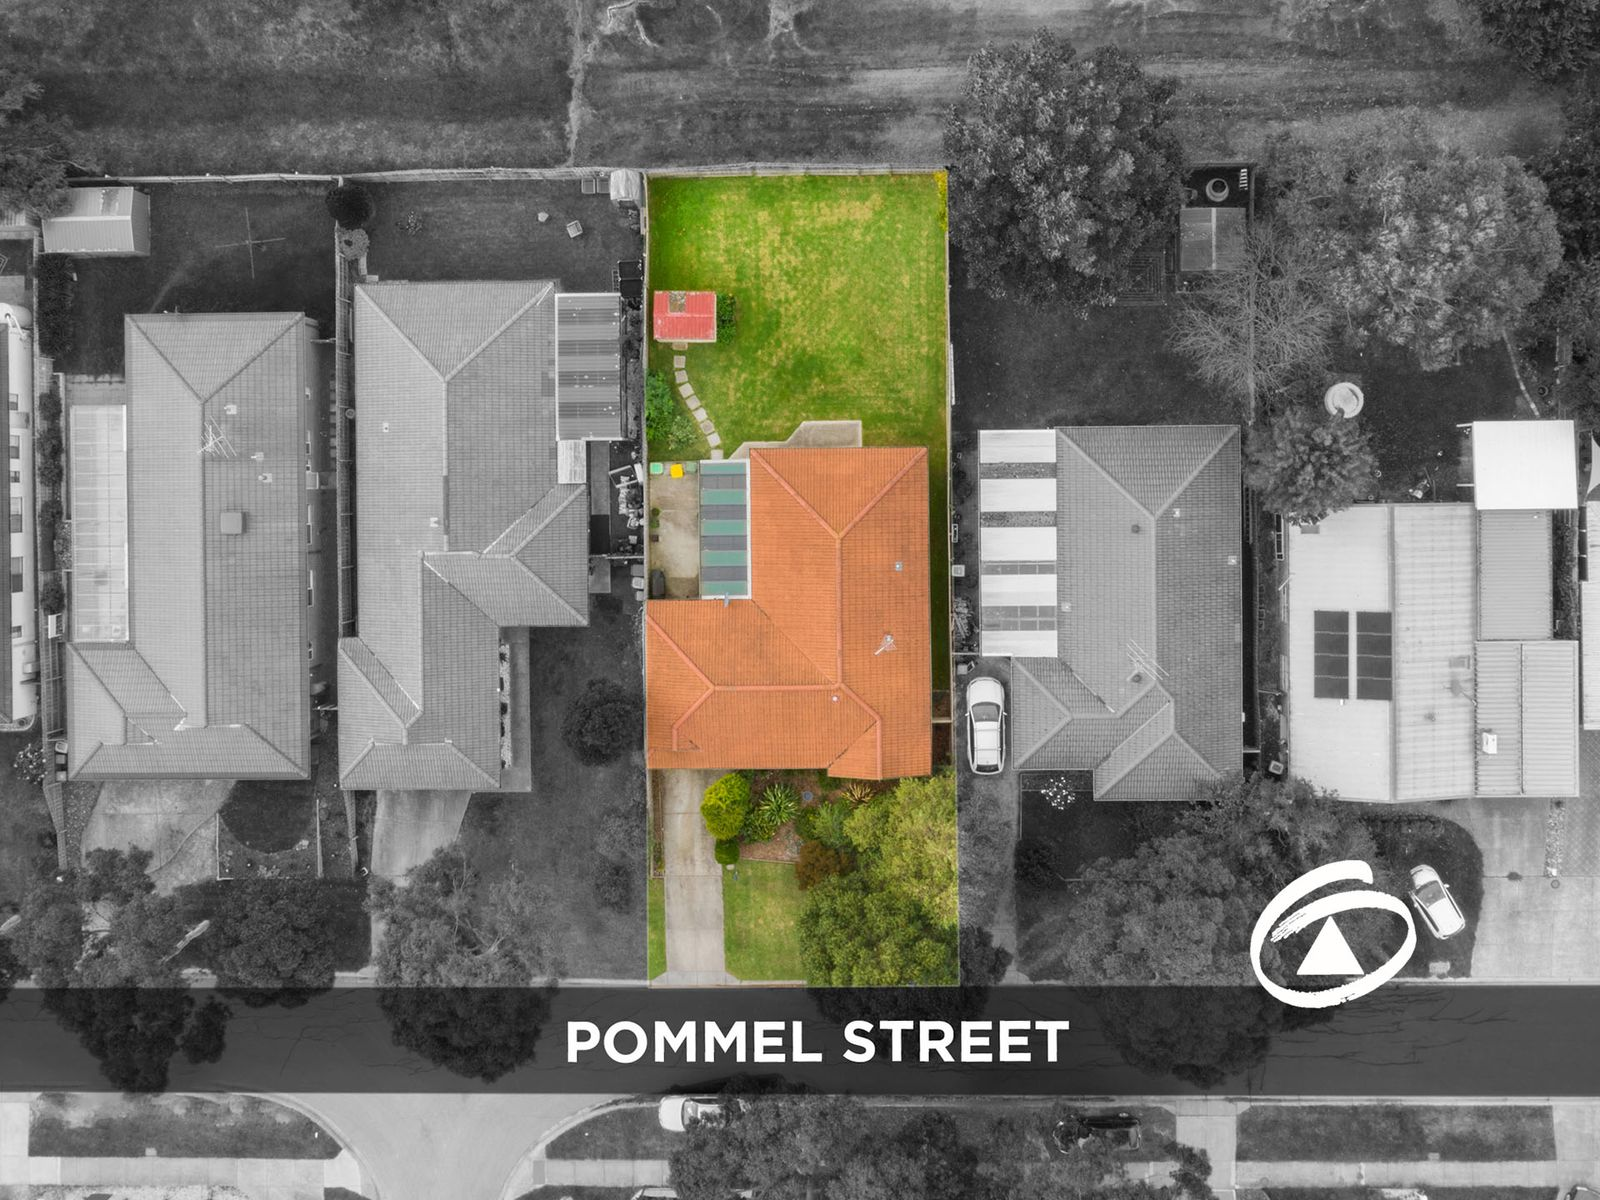 40 Pommel Street, Pakenham, VIC 3810